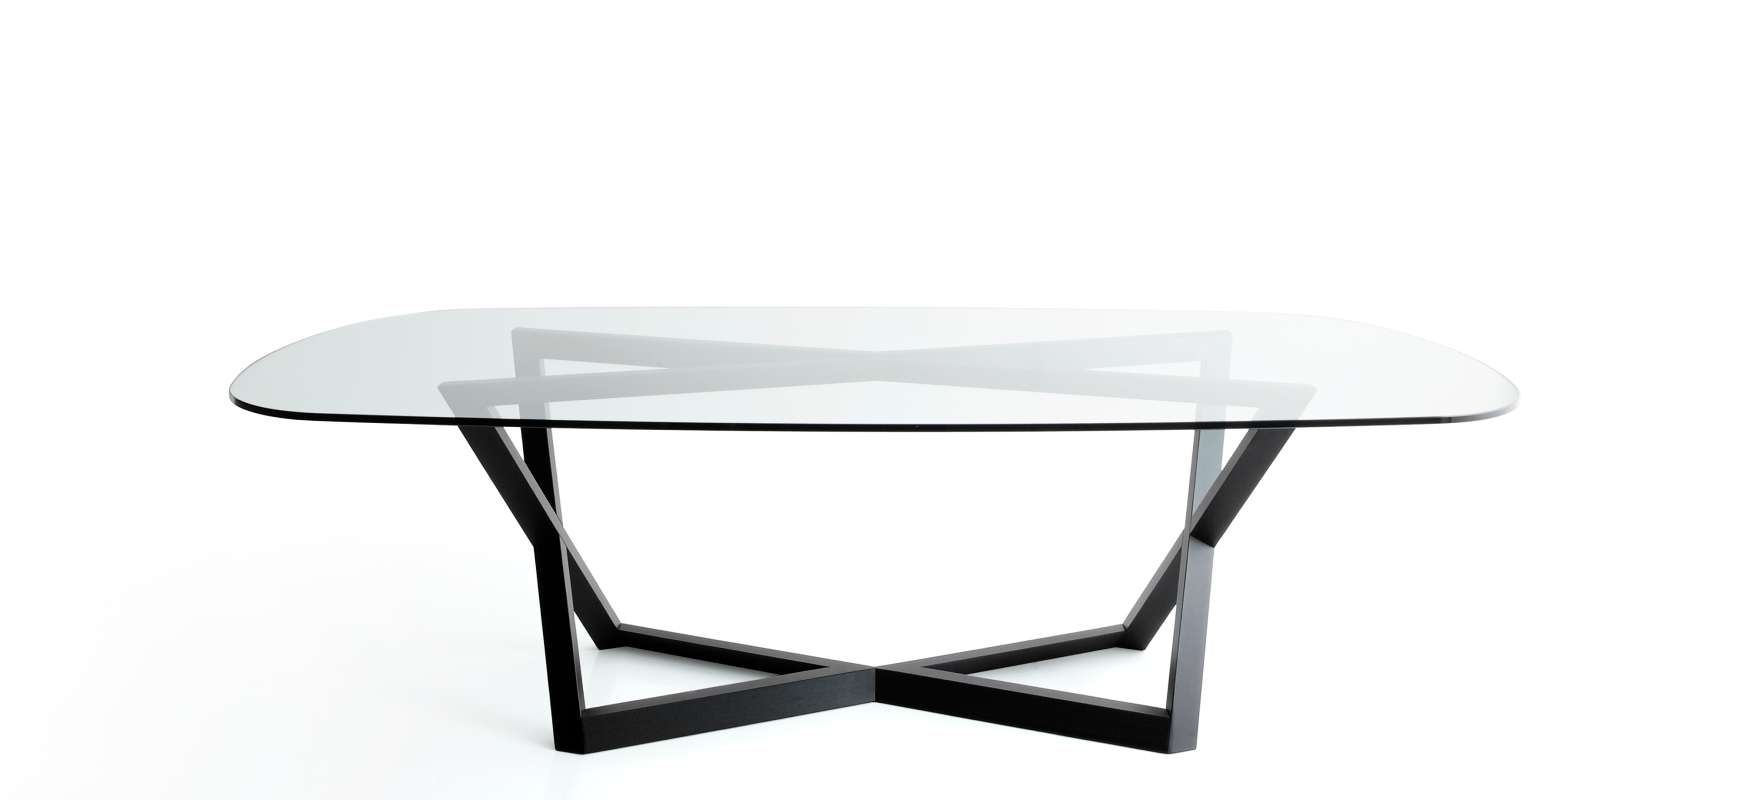 Studio Marco Piva – Product design – 66